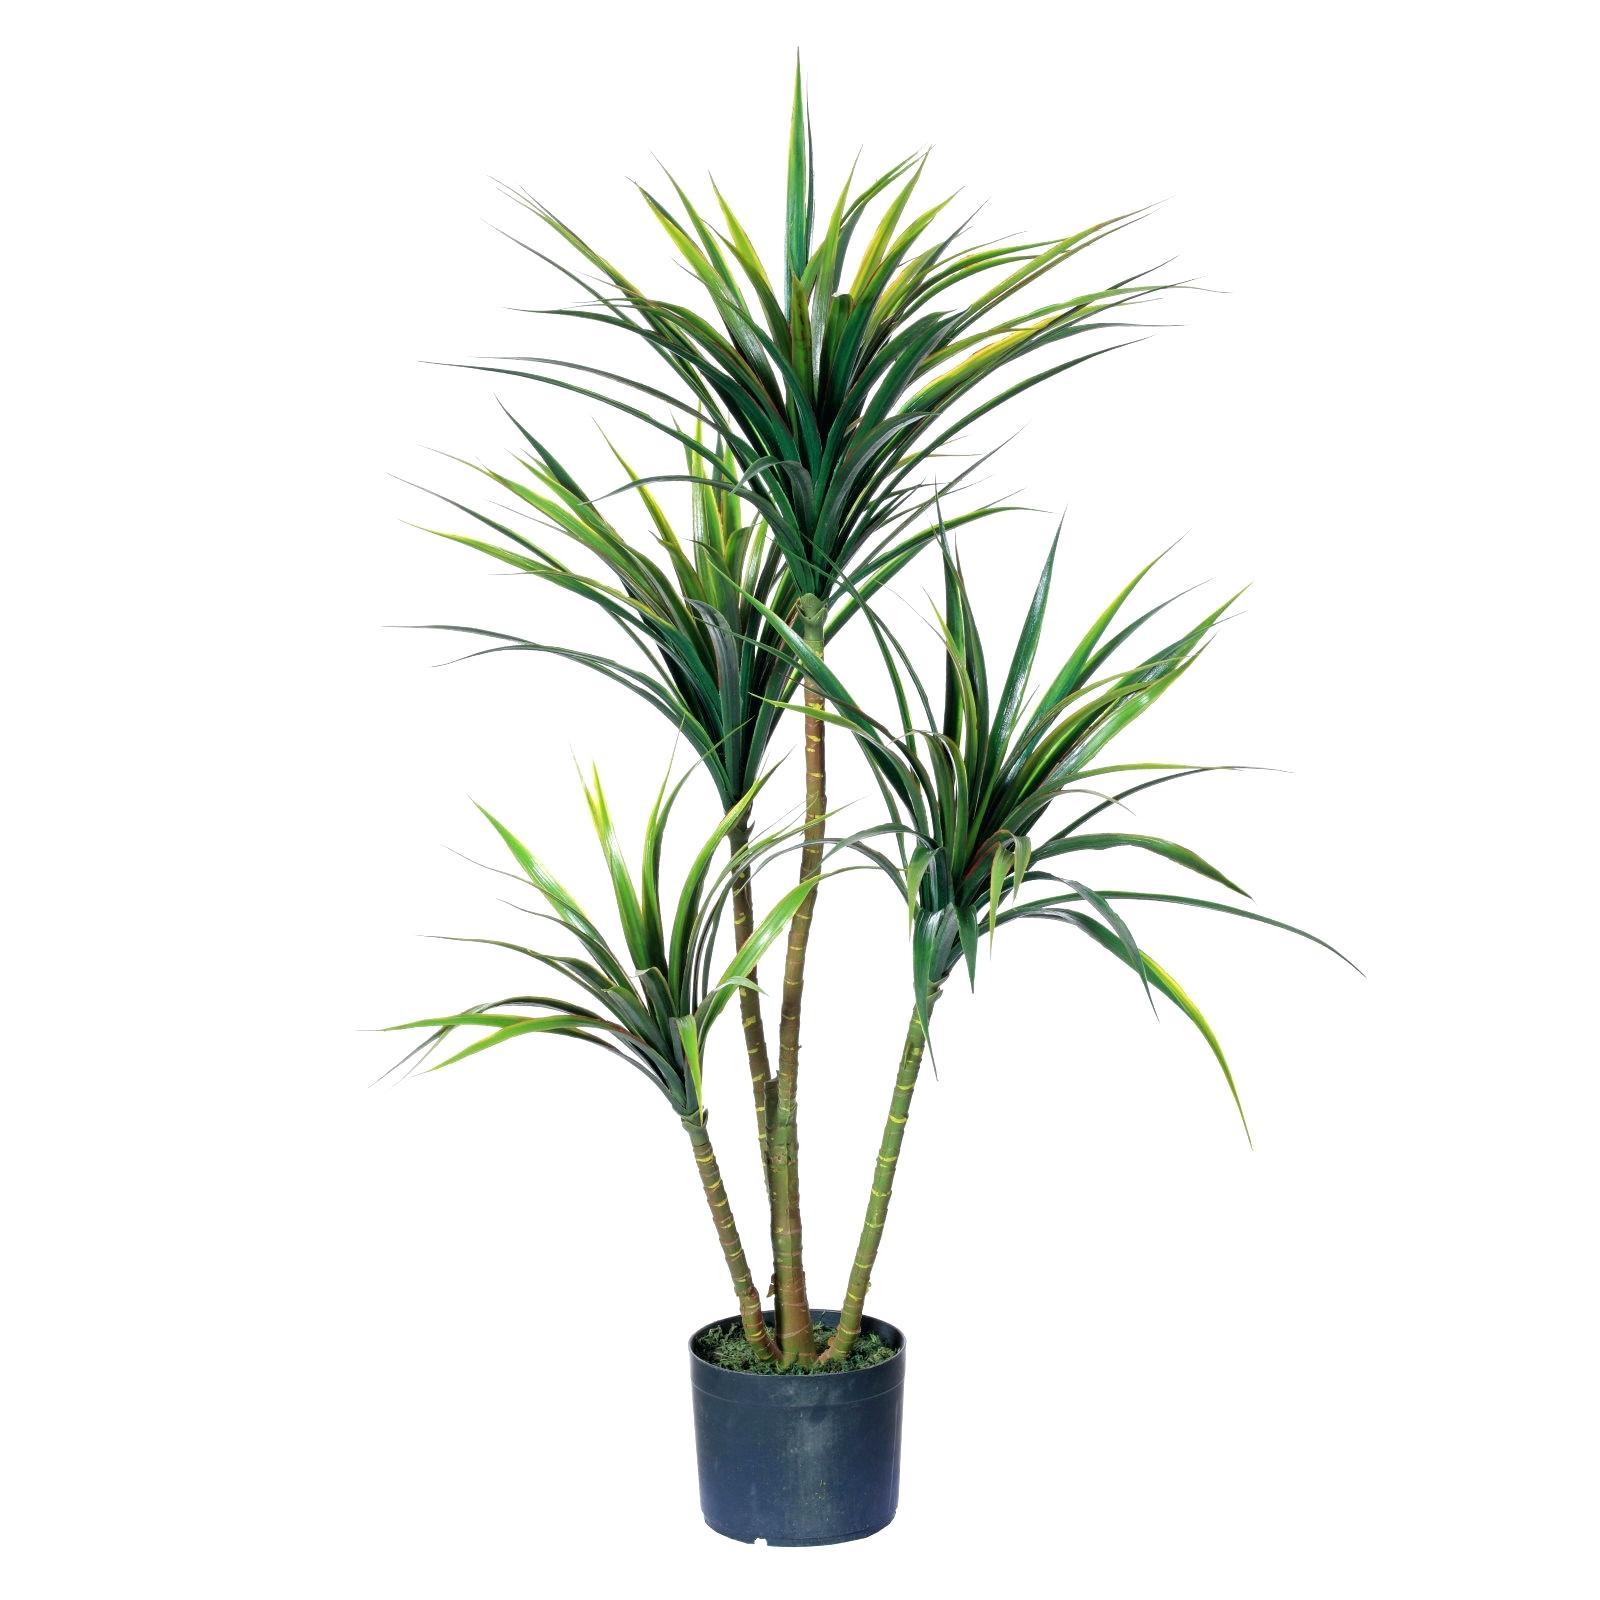 Yukka Plant Yucca Care Instructions Yucca Plant Root Damage ...